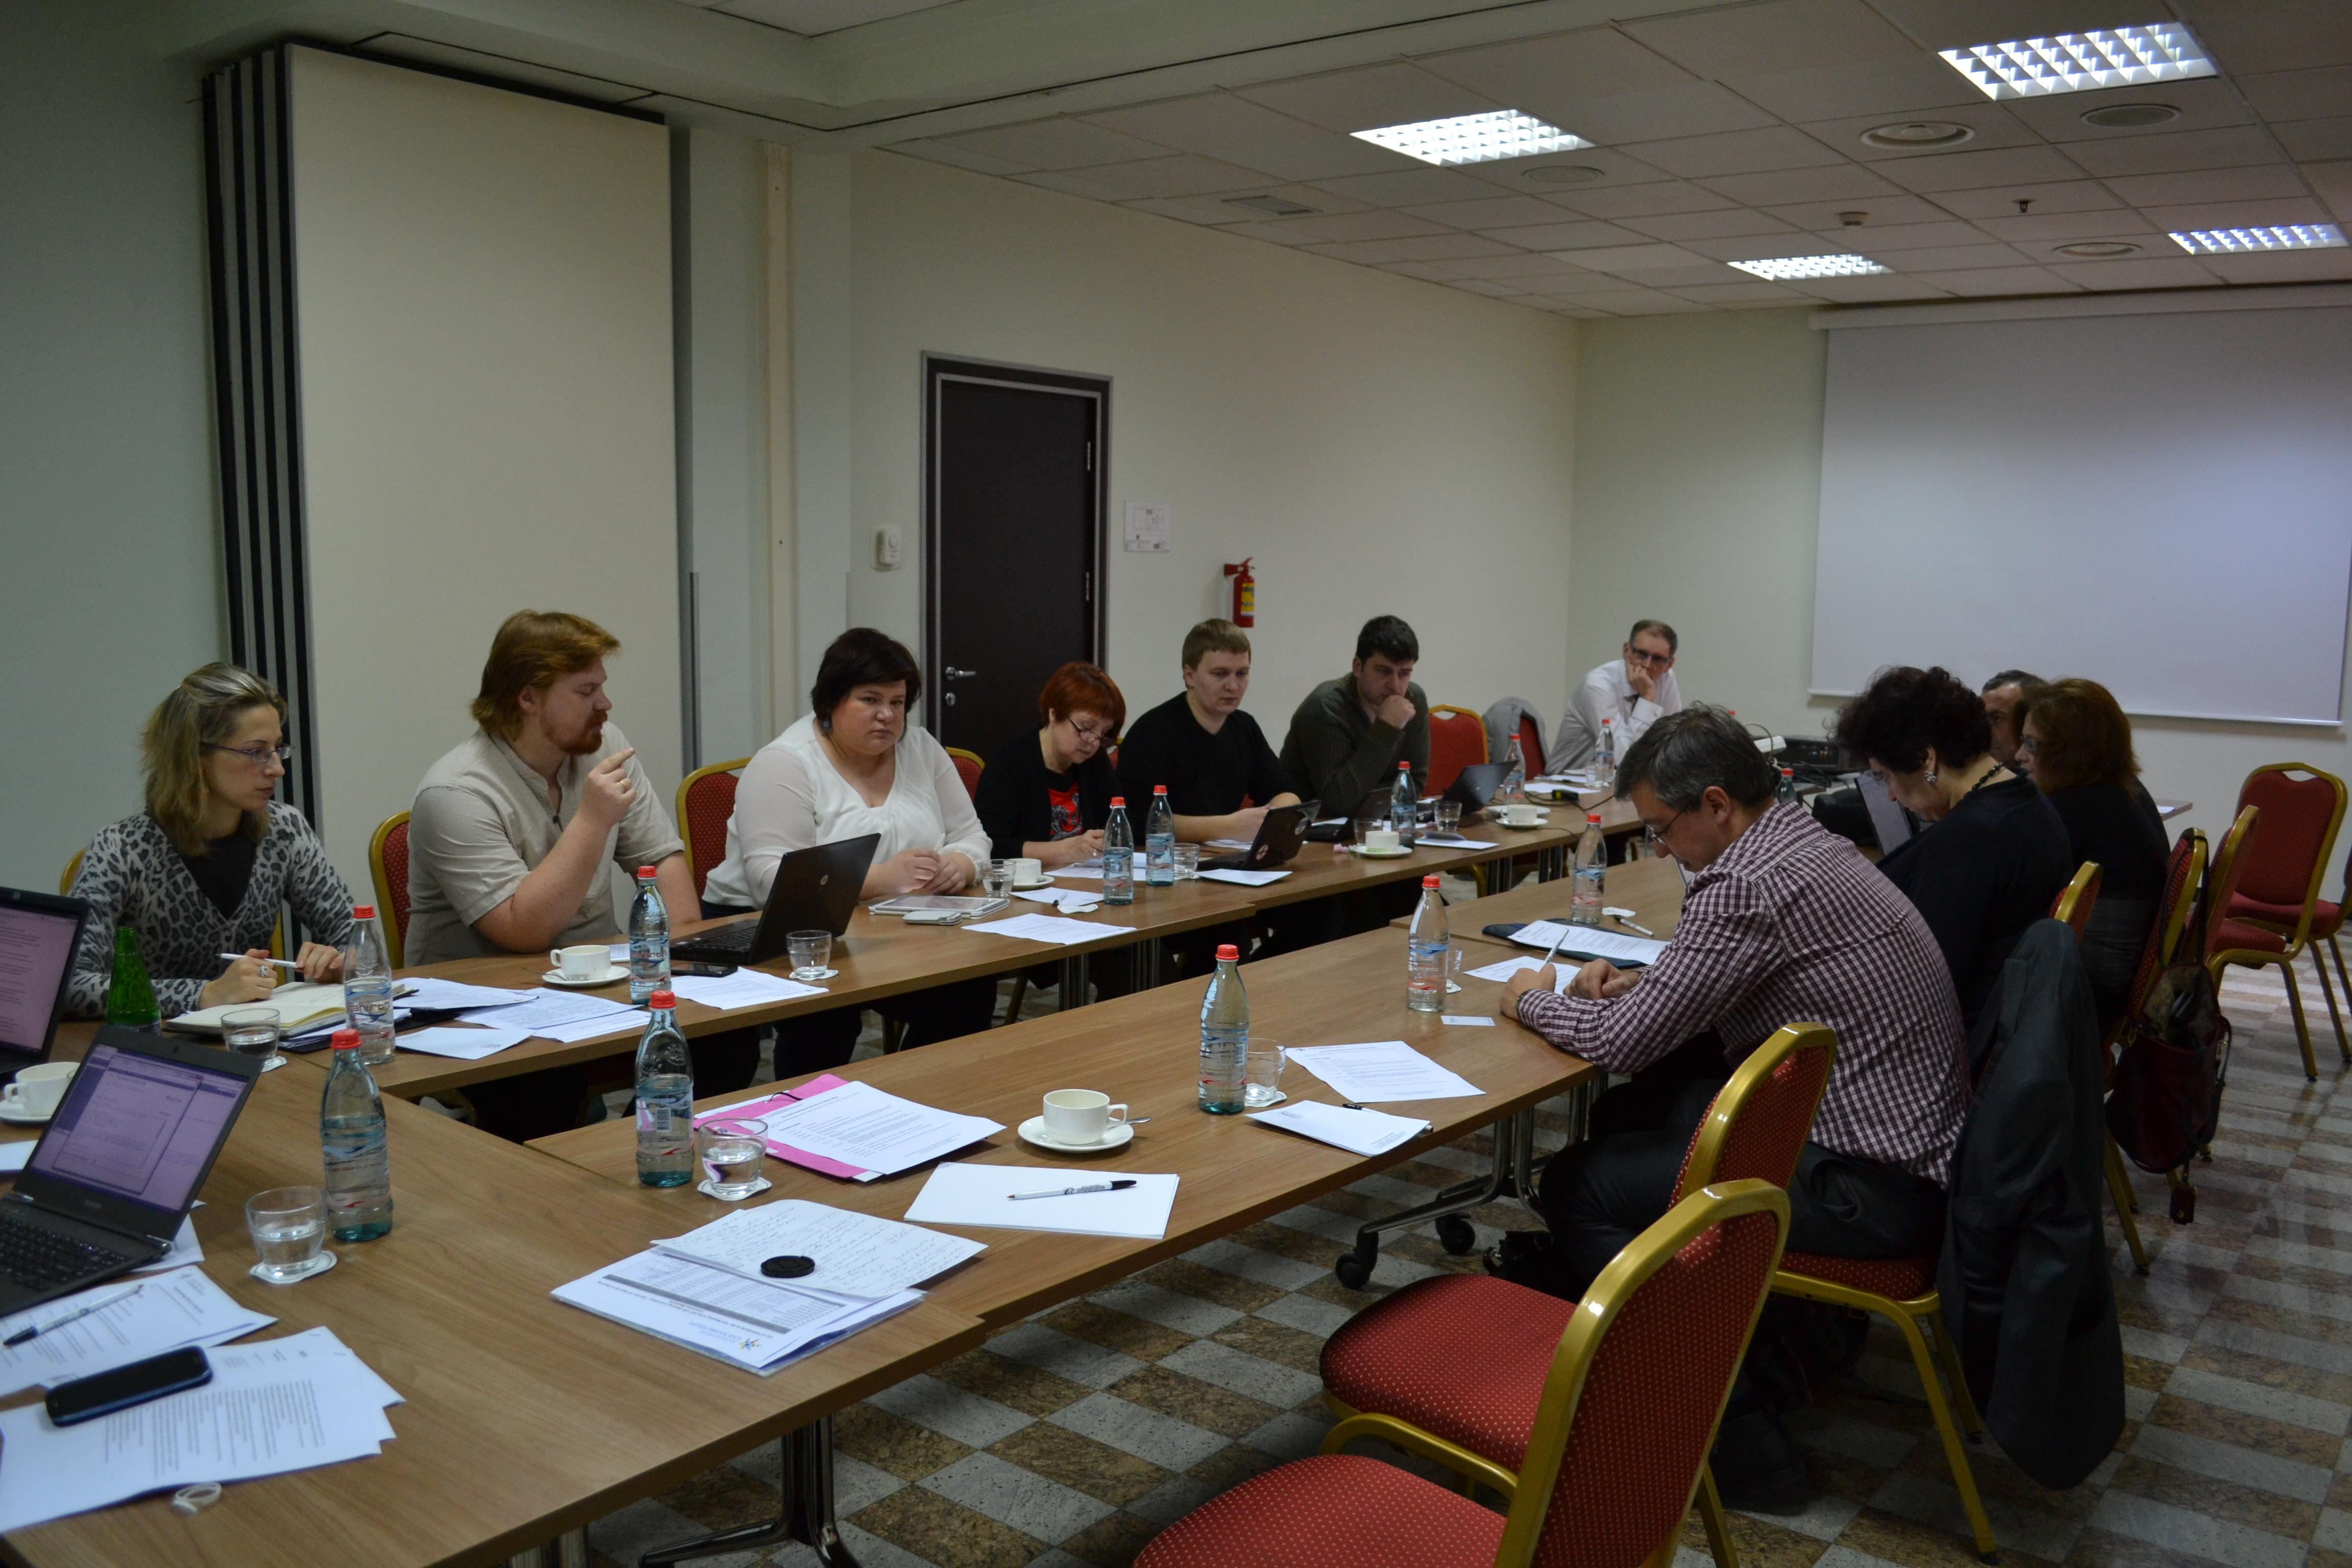 Armenien_2013-04-04_002